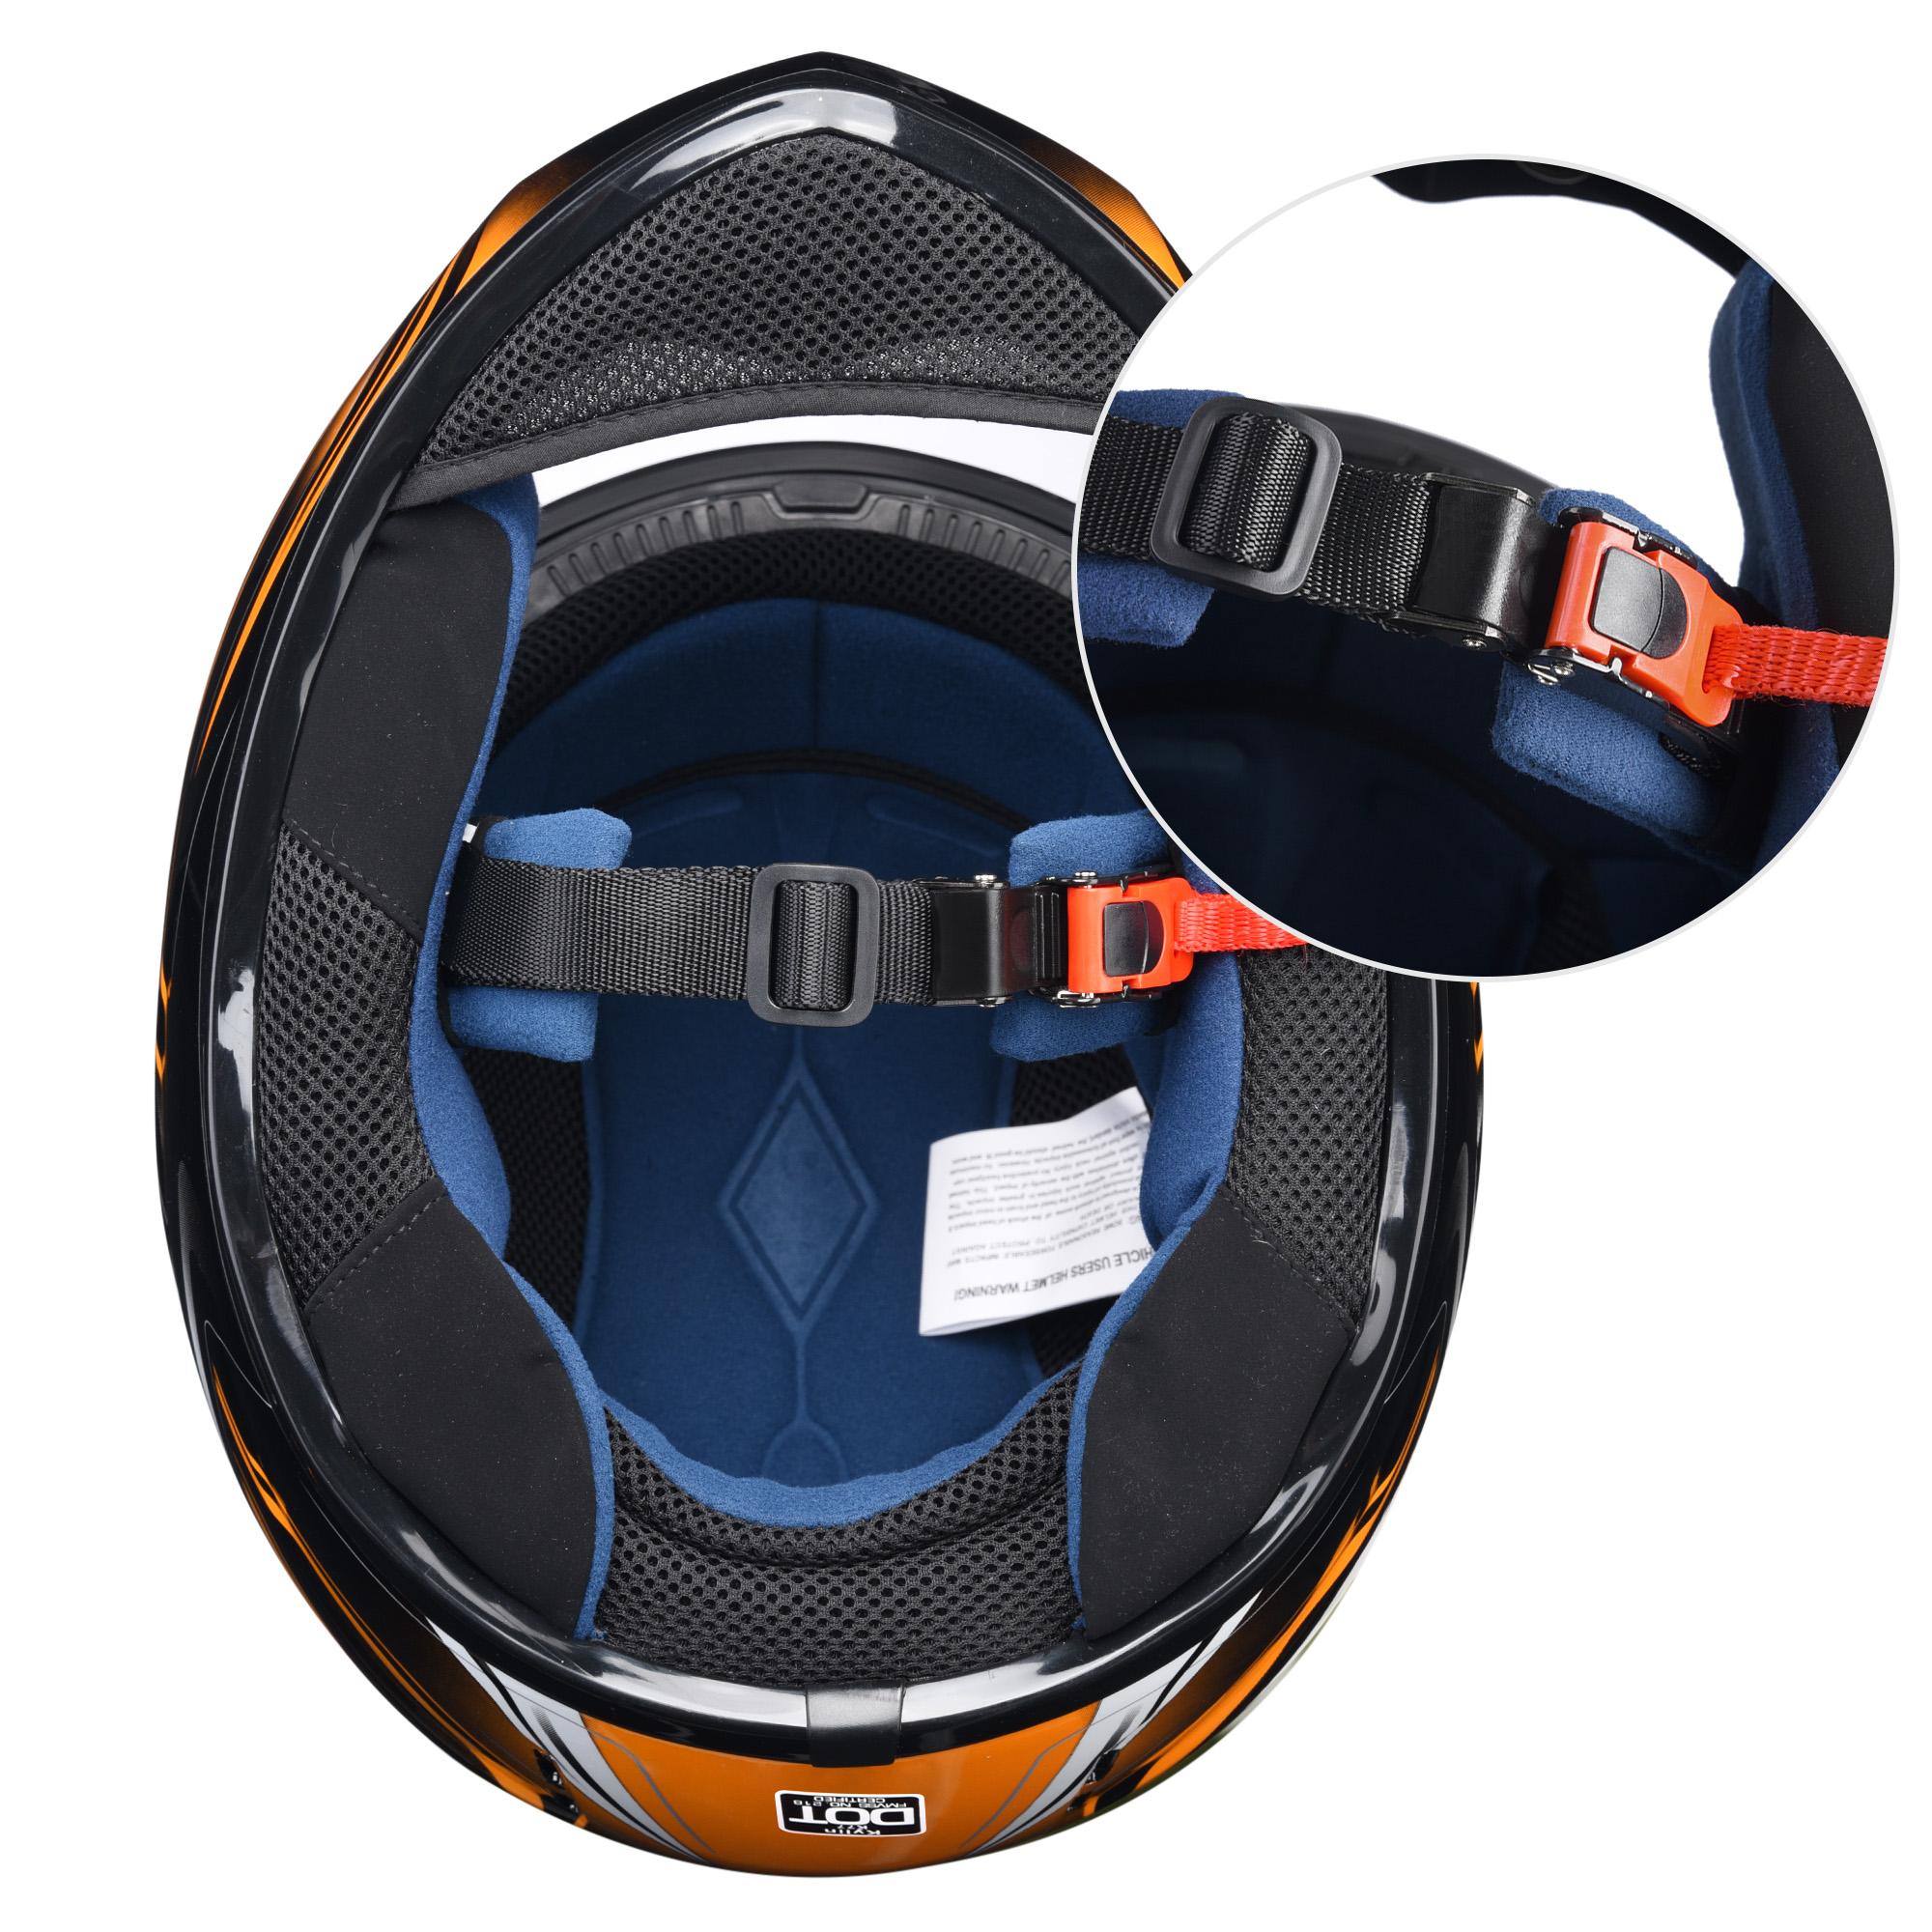 miniature 80 - AHR K12 Full Face Motorcycle Helmet DOT Air Vents Clear Visor Racing S M L XL